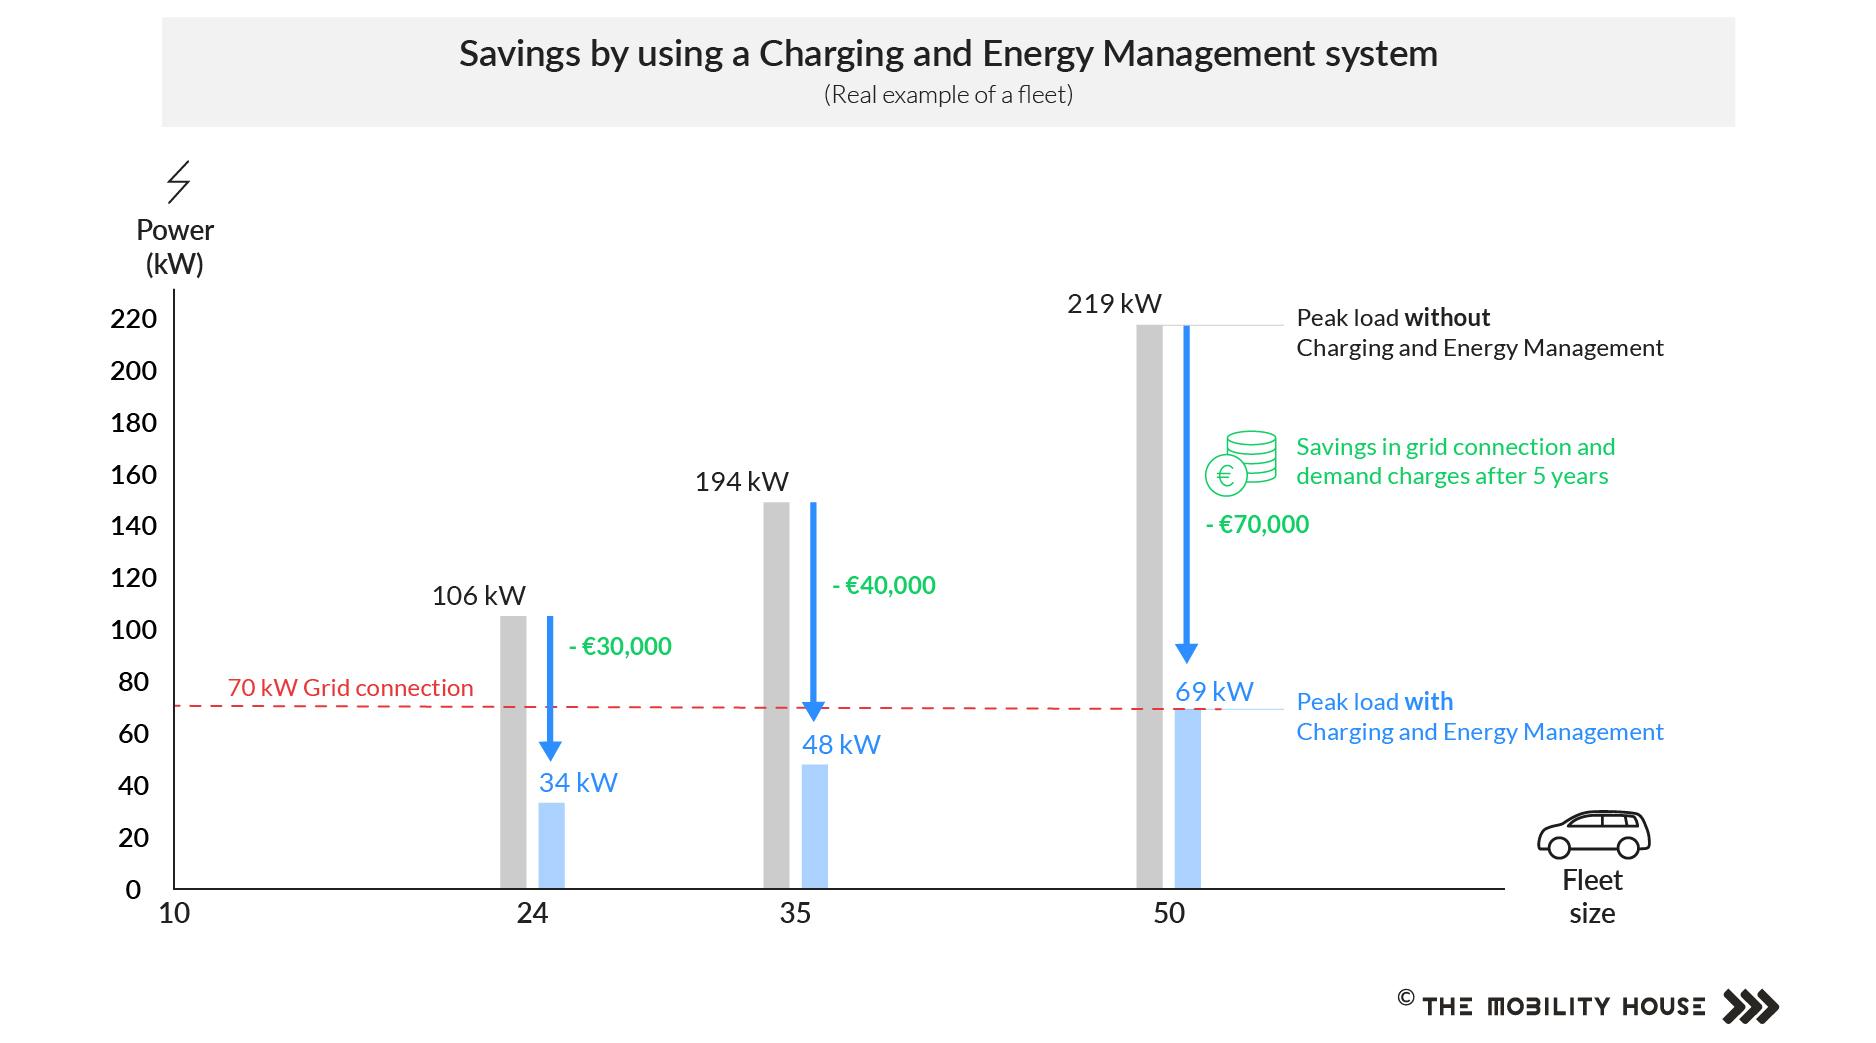 Electric fleet savings when using an energy management system